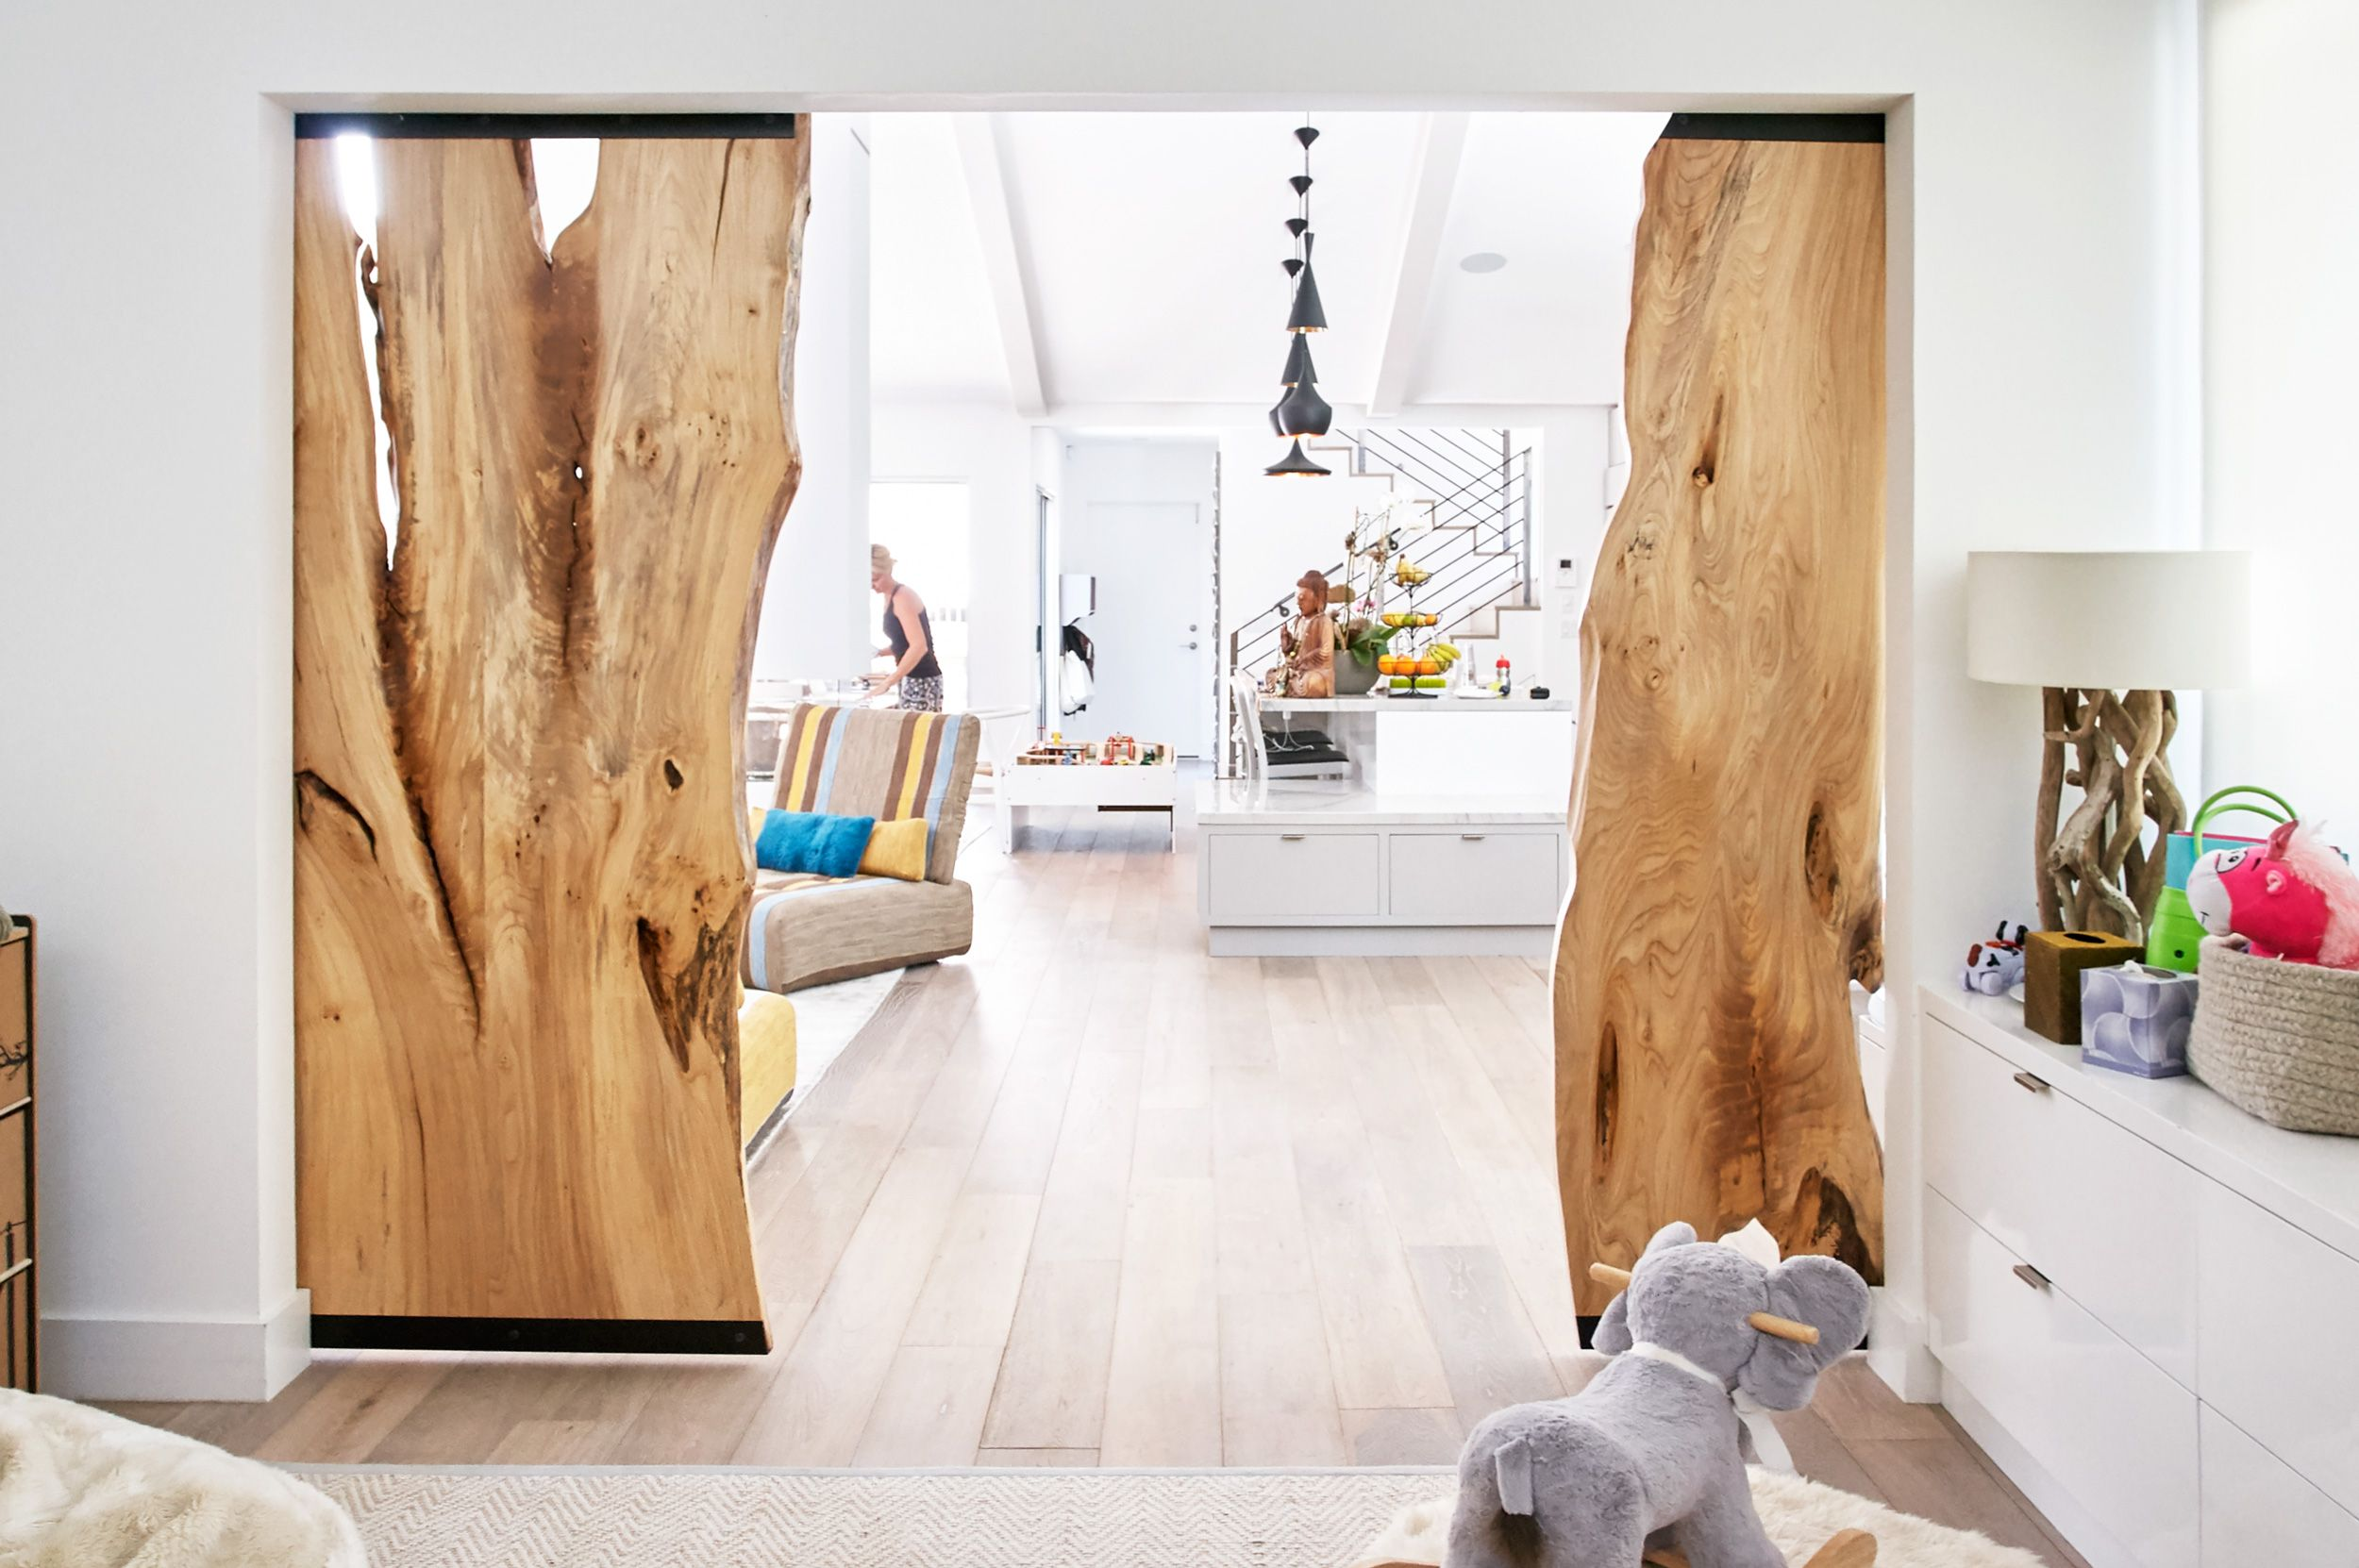 custom American elm barn doors in finished application #UrbanHardwoods #SalvagedWood #custom & custom American elm barn doors in finished application ...